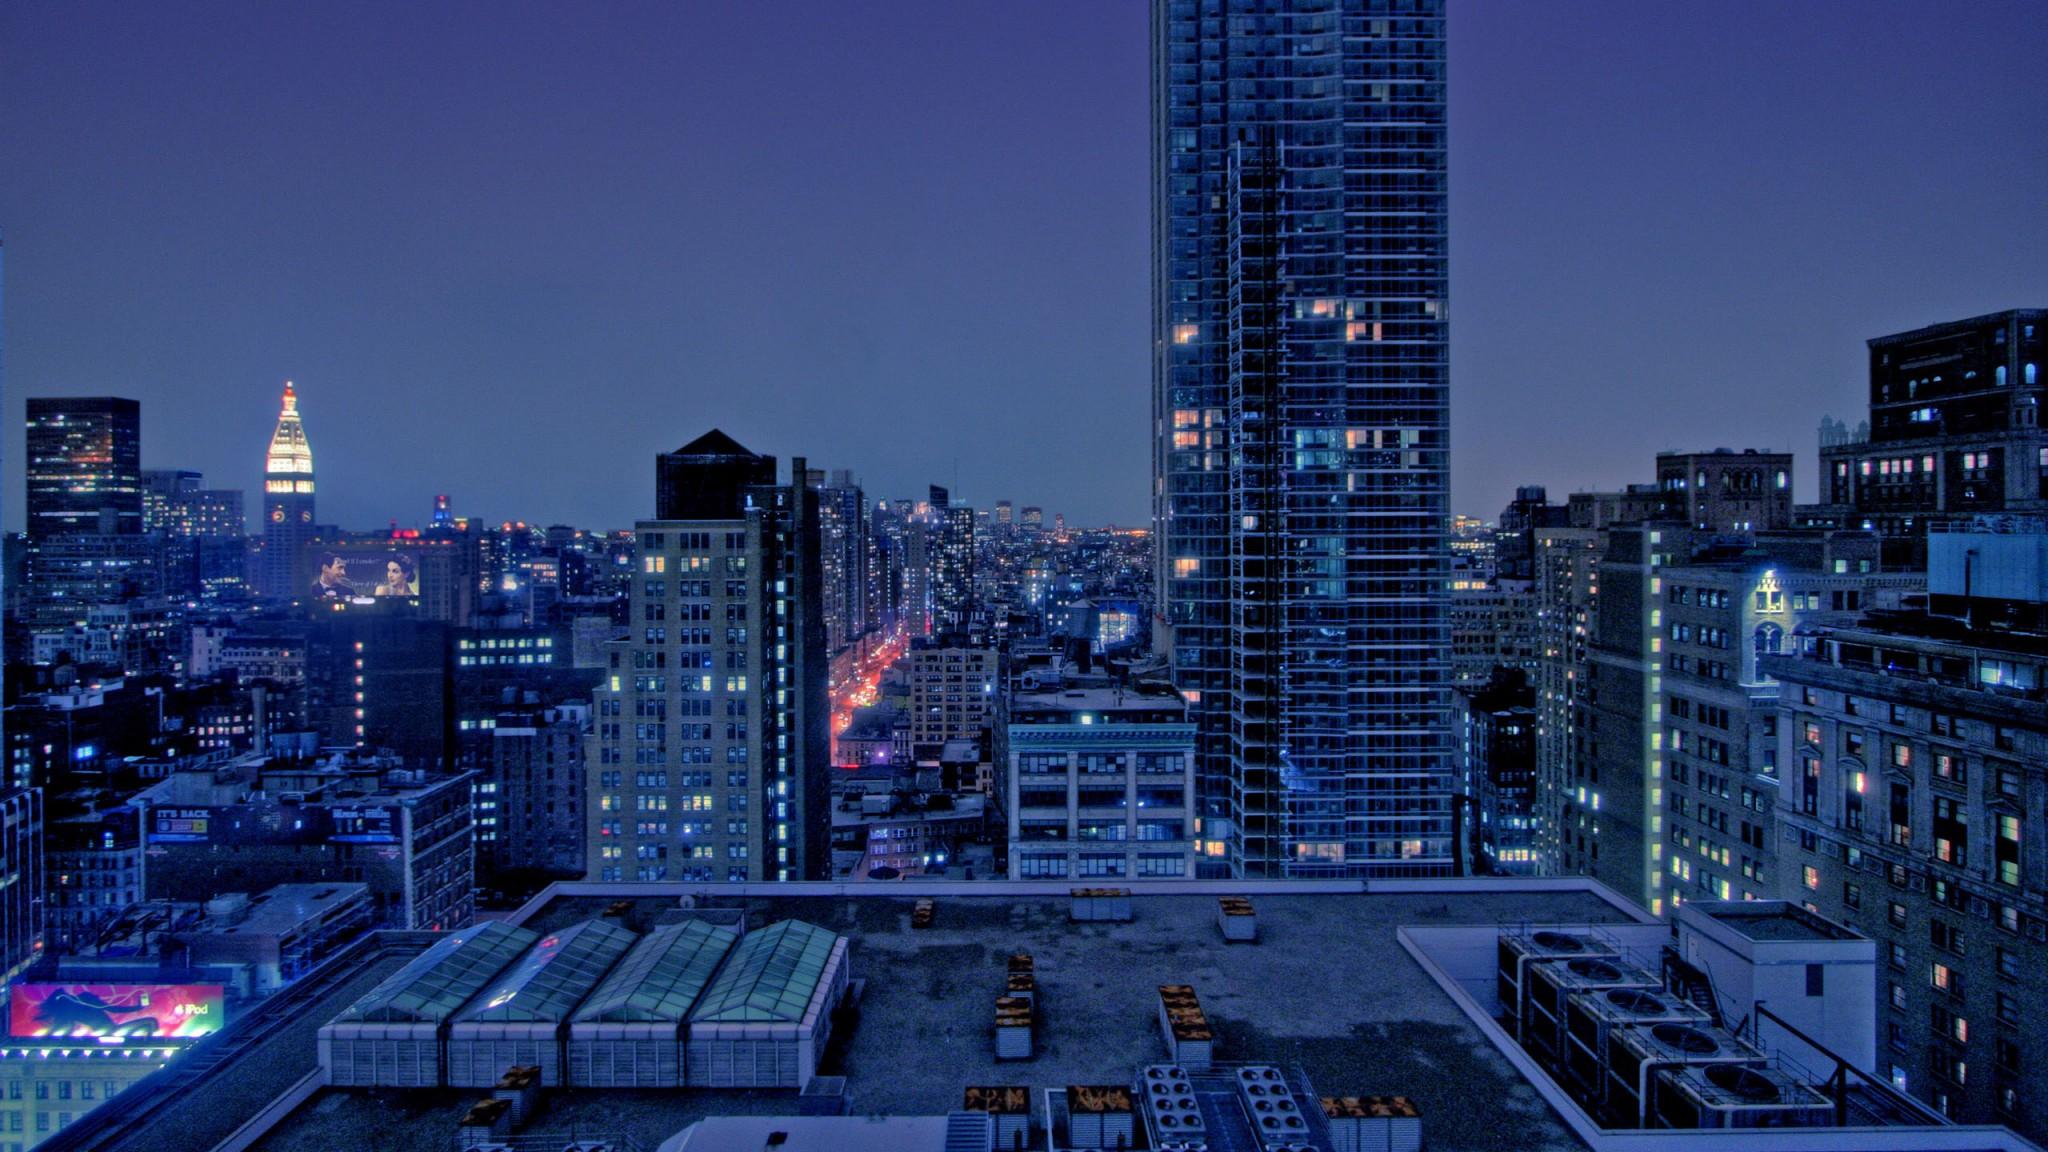 city  skyscrapers  night  manhattan  new york  usa  world   Free HD Wallpaper